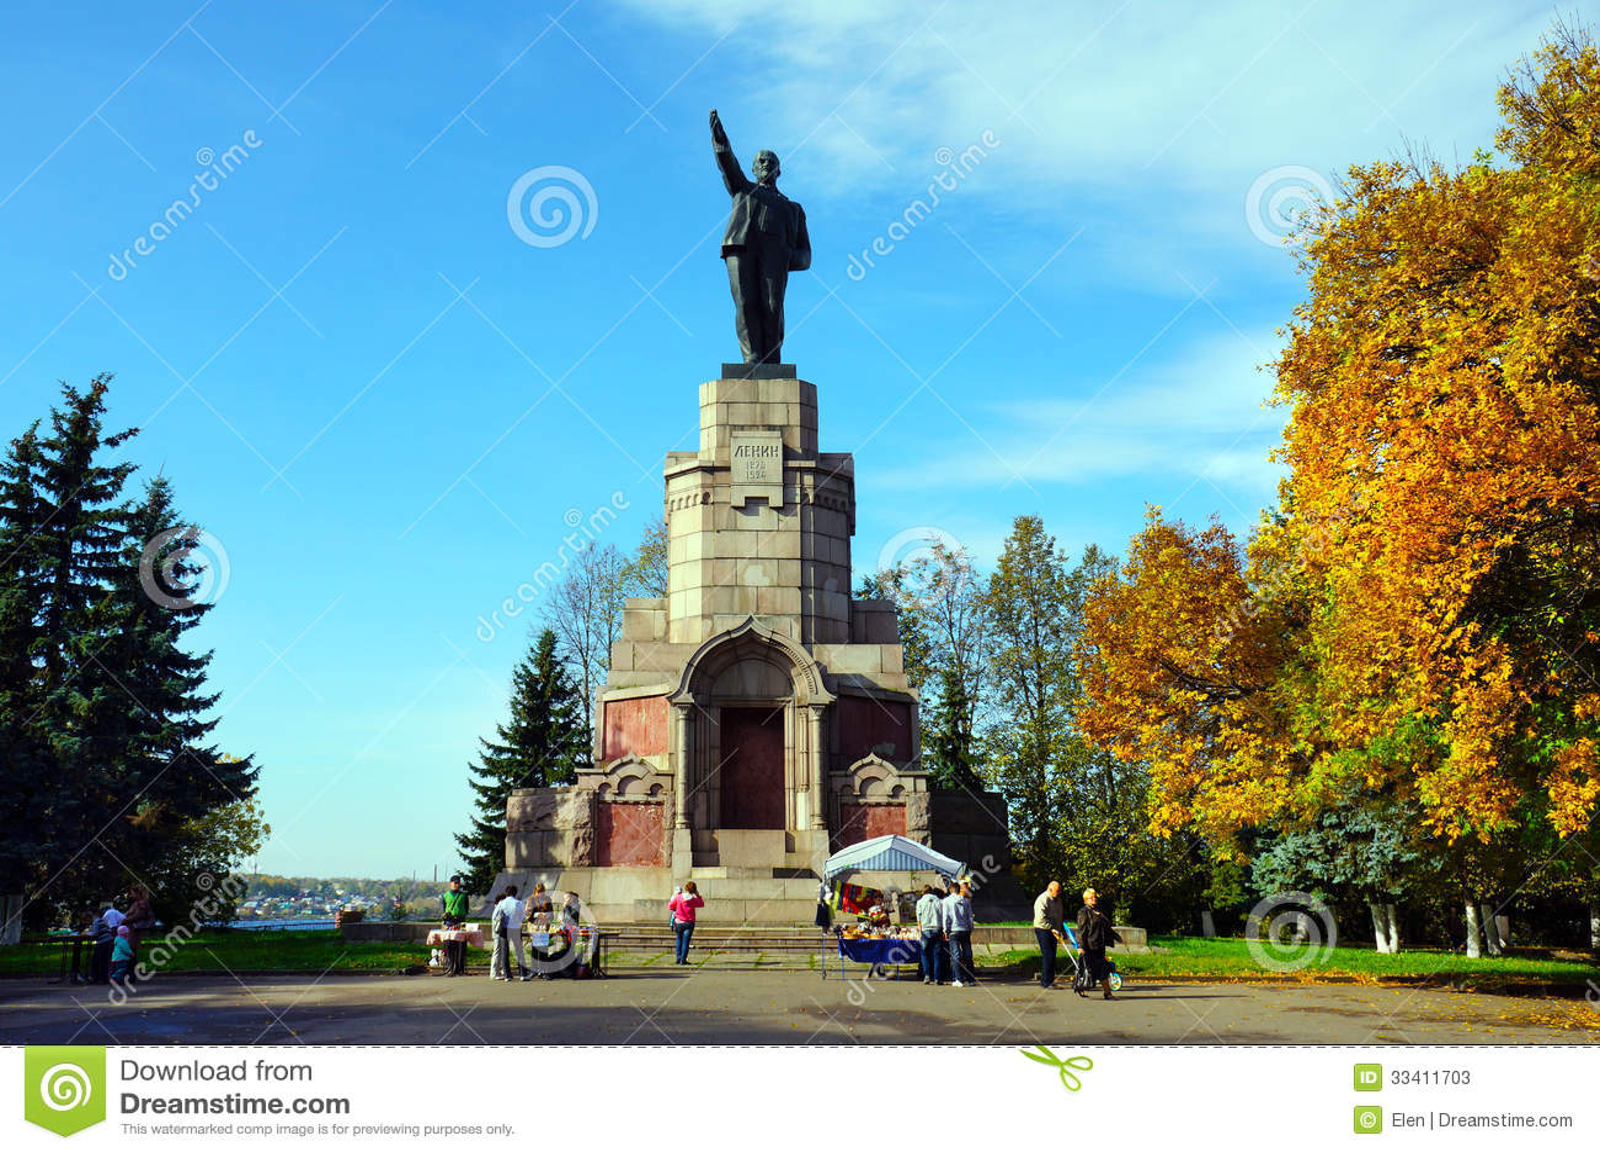 Kostroma Russia  city images : Russia, Kostroma City, Lenin Editorial Stock Photo Image: 33411703